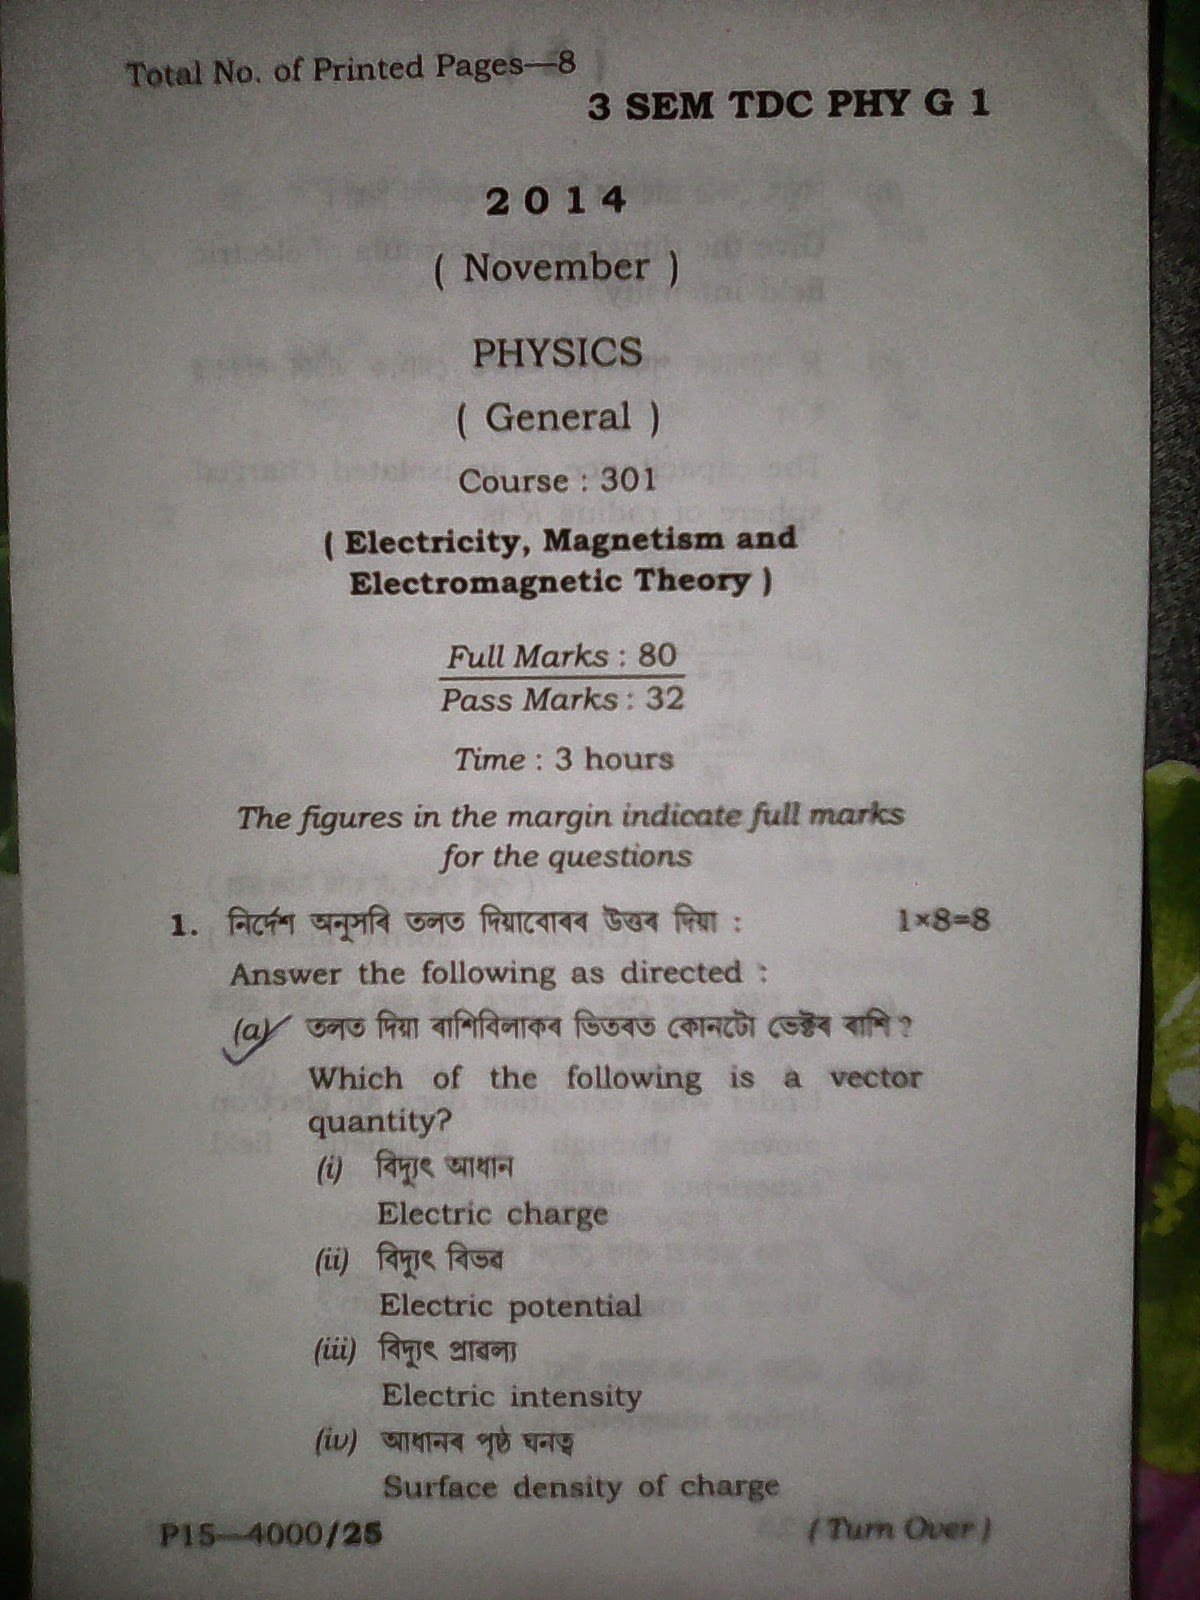 Dibrugarh University B SC Question Paper 3rd SEM Physics November